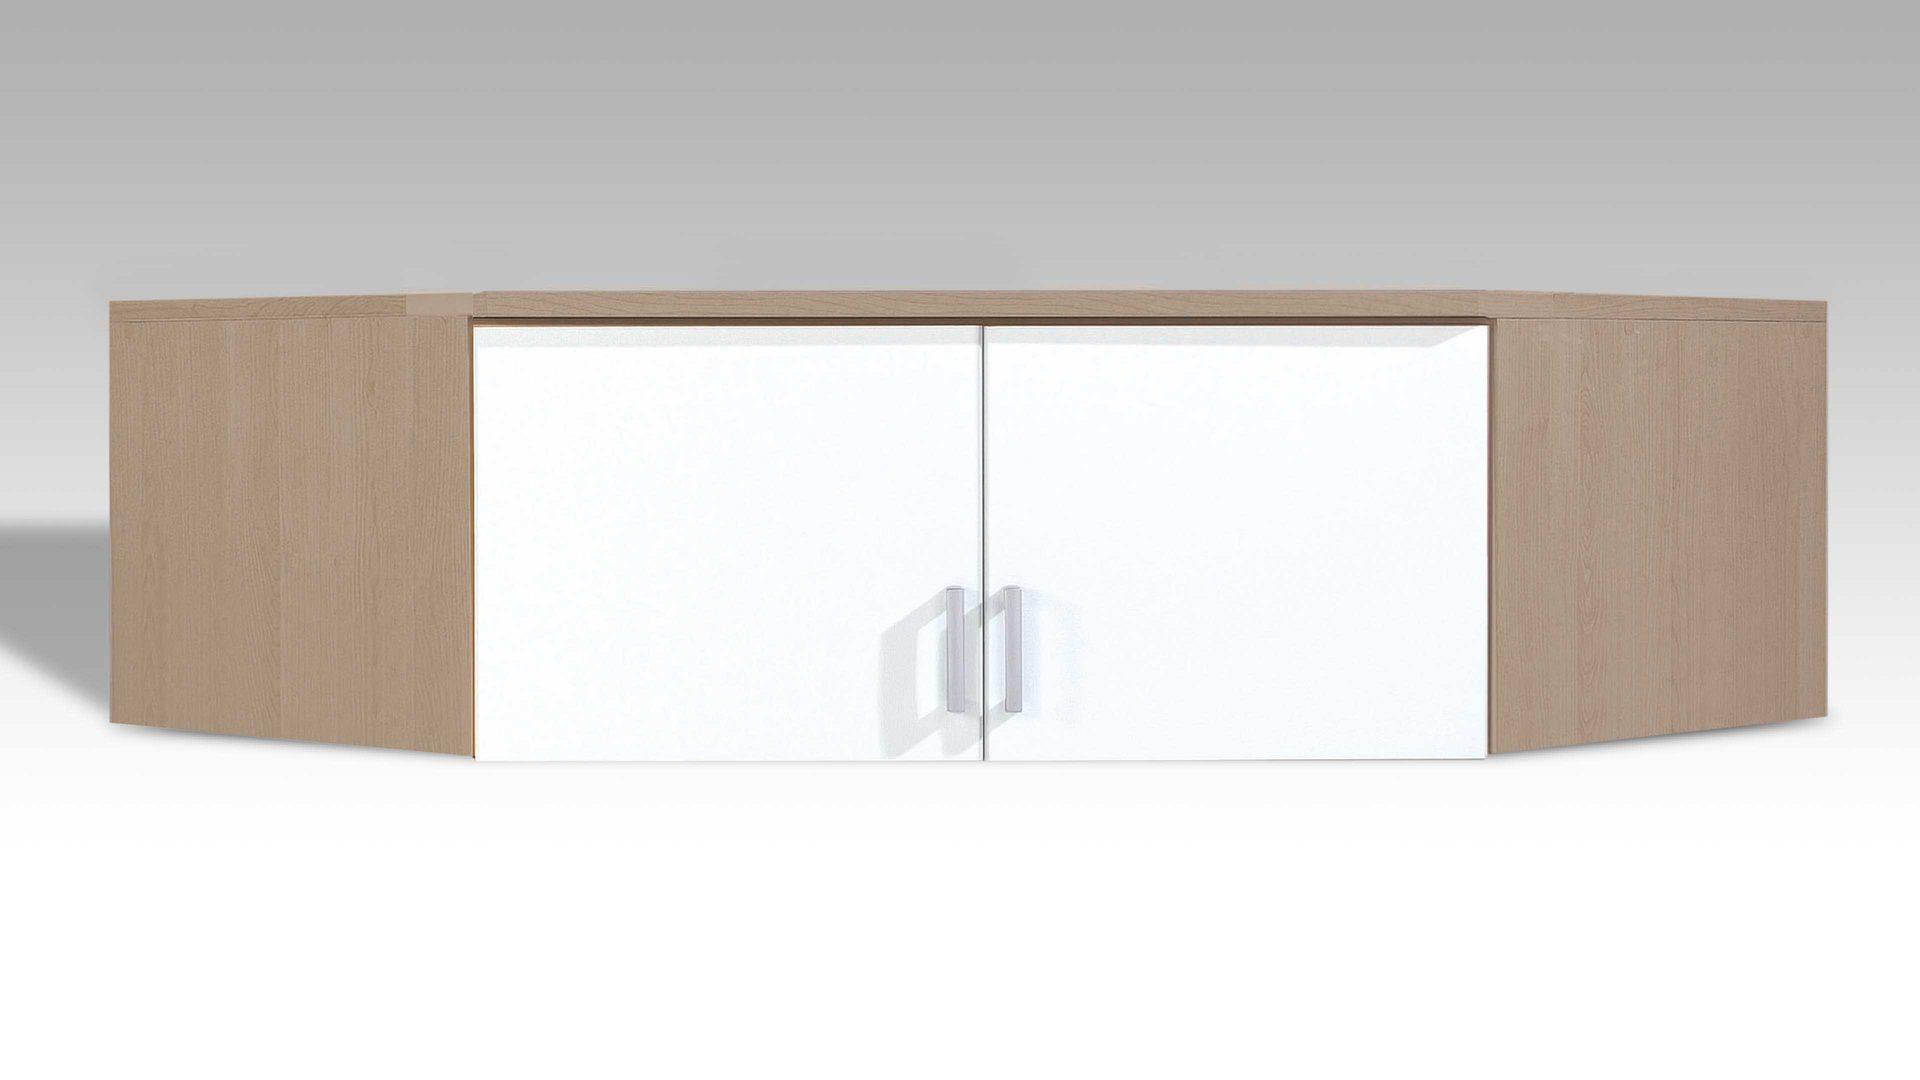 Möbel Bohn Crailsheim, rauch PACKS Eckschrank-Aufsatz komplettiert ...